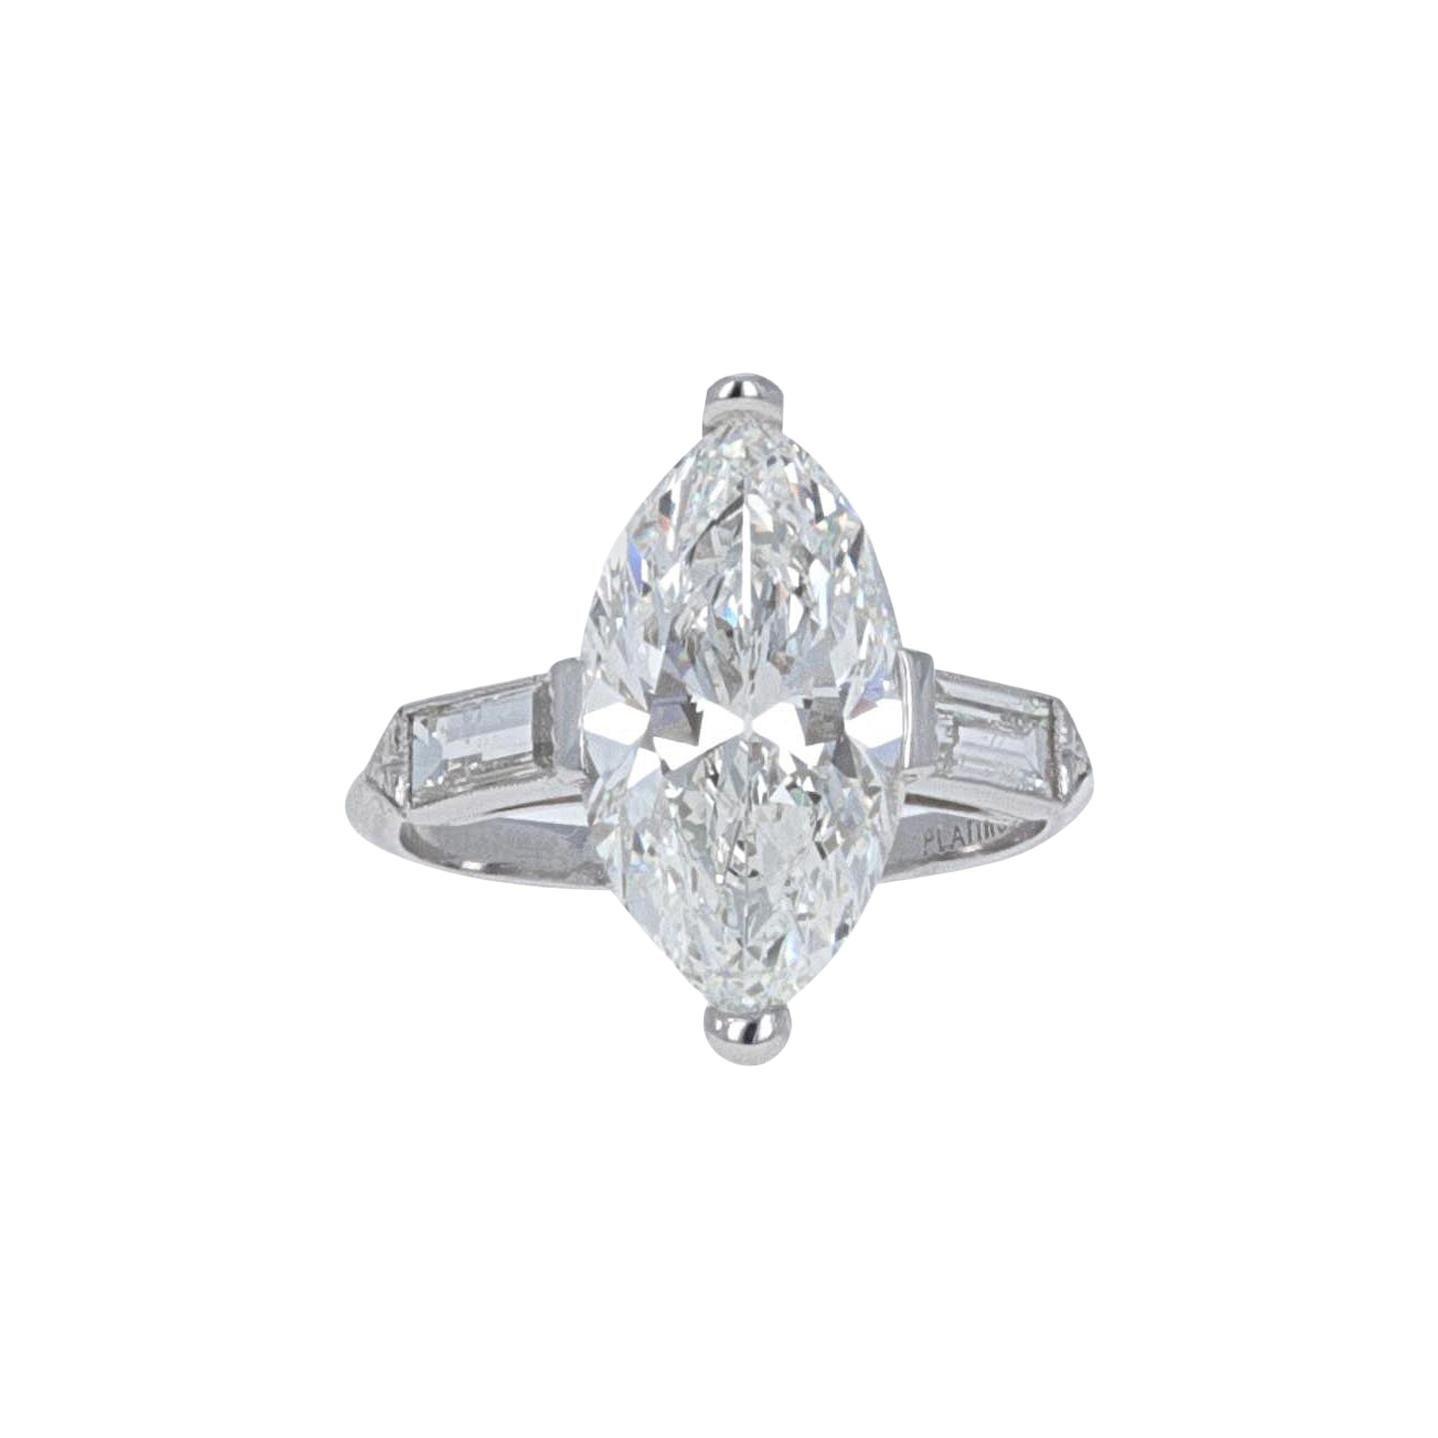 GIA Certified, Antique Cut 4.02 Carat H- VVS2 Diamond Engagement Ring